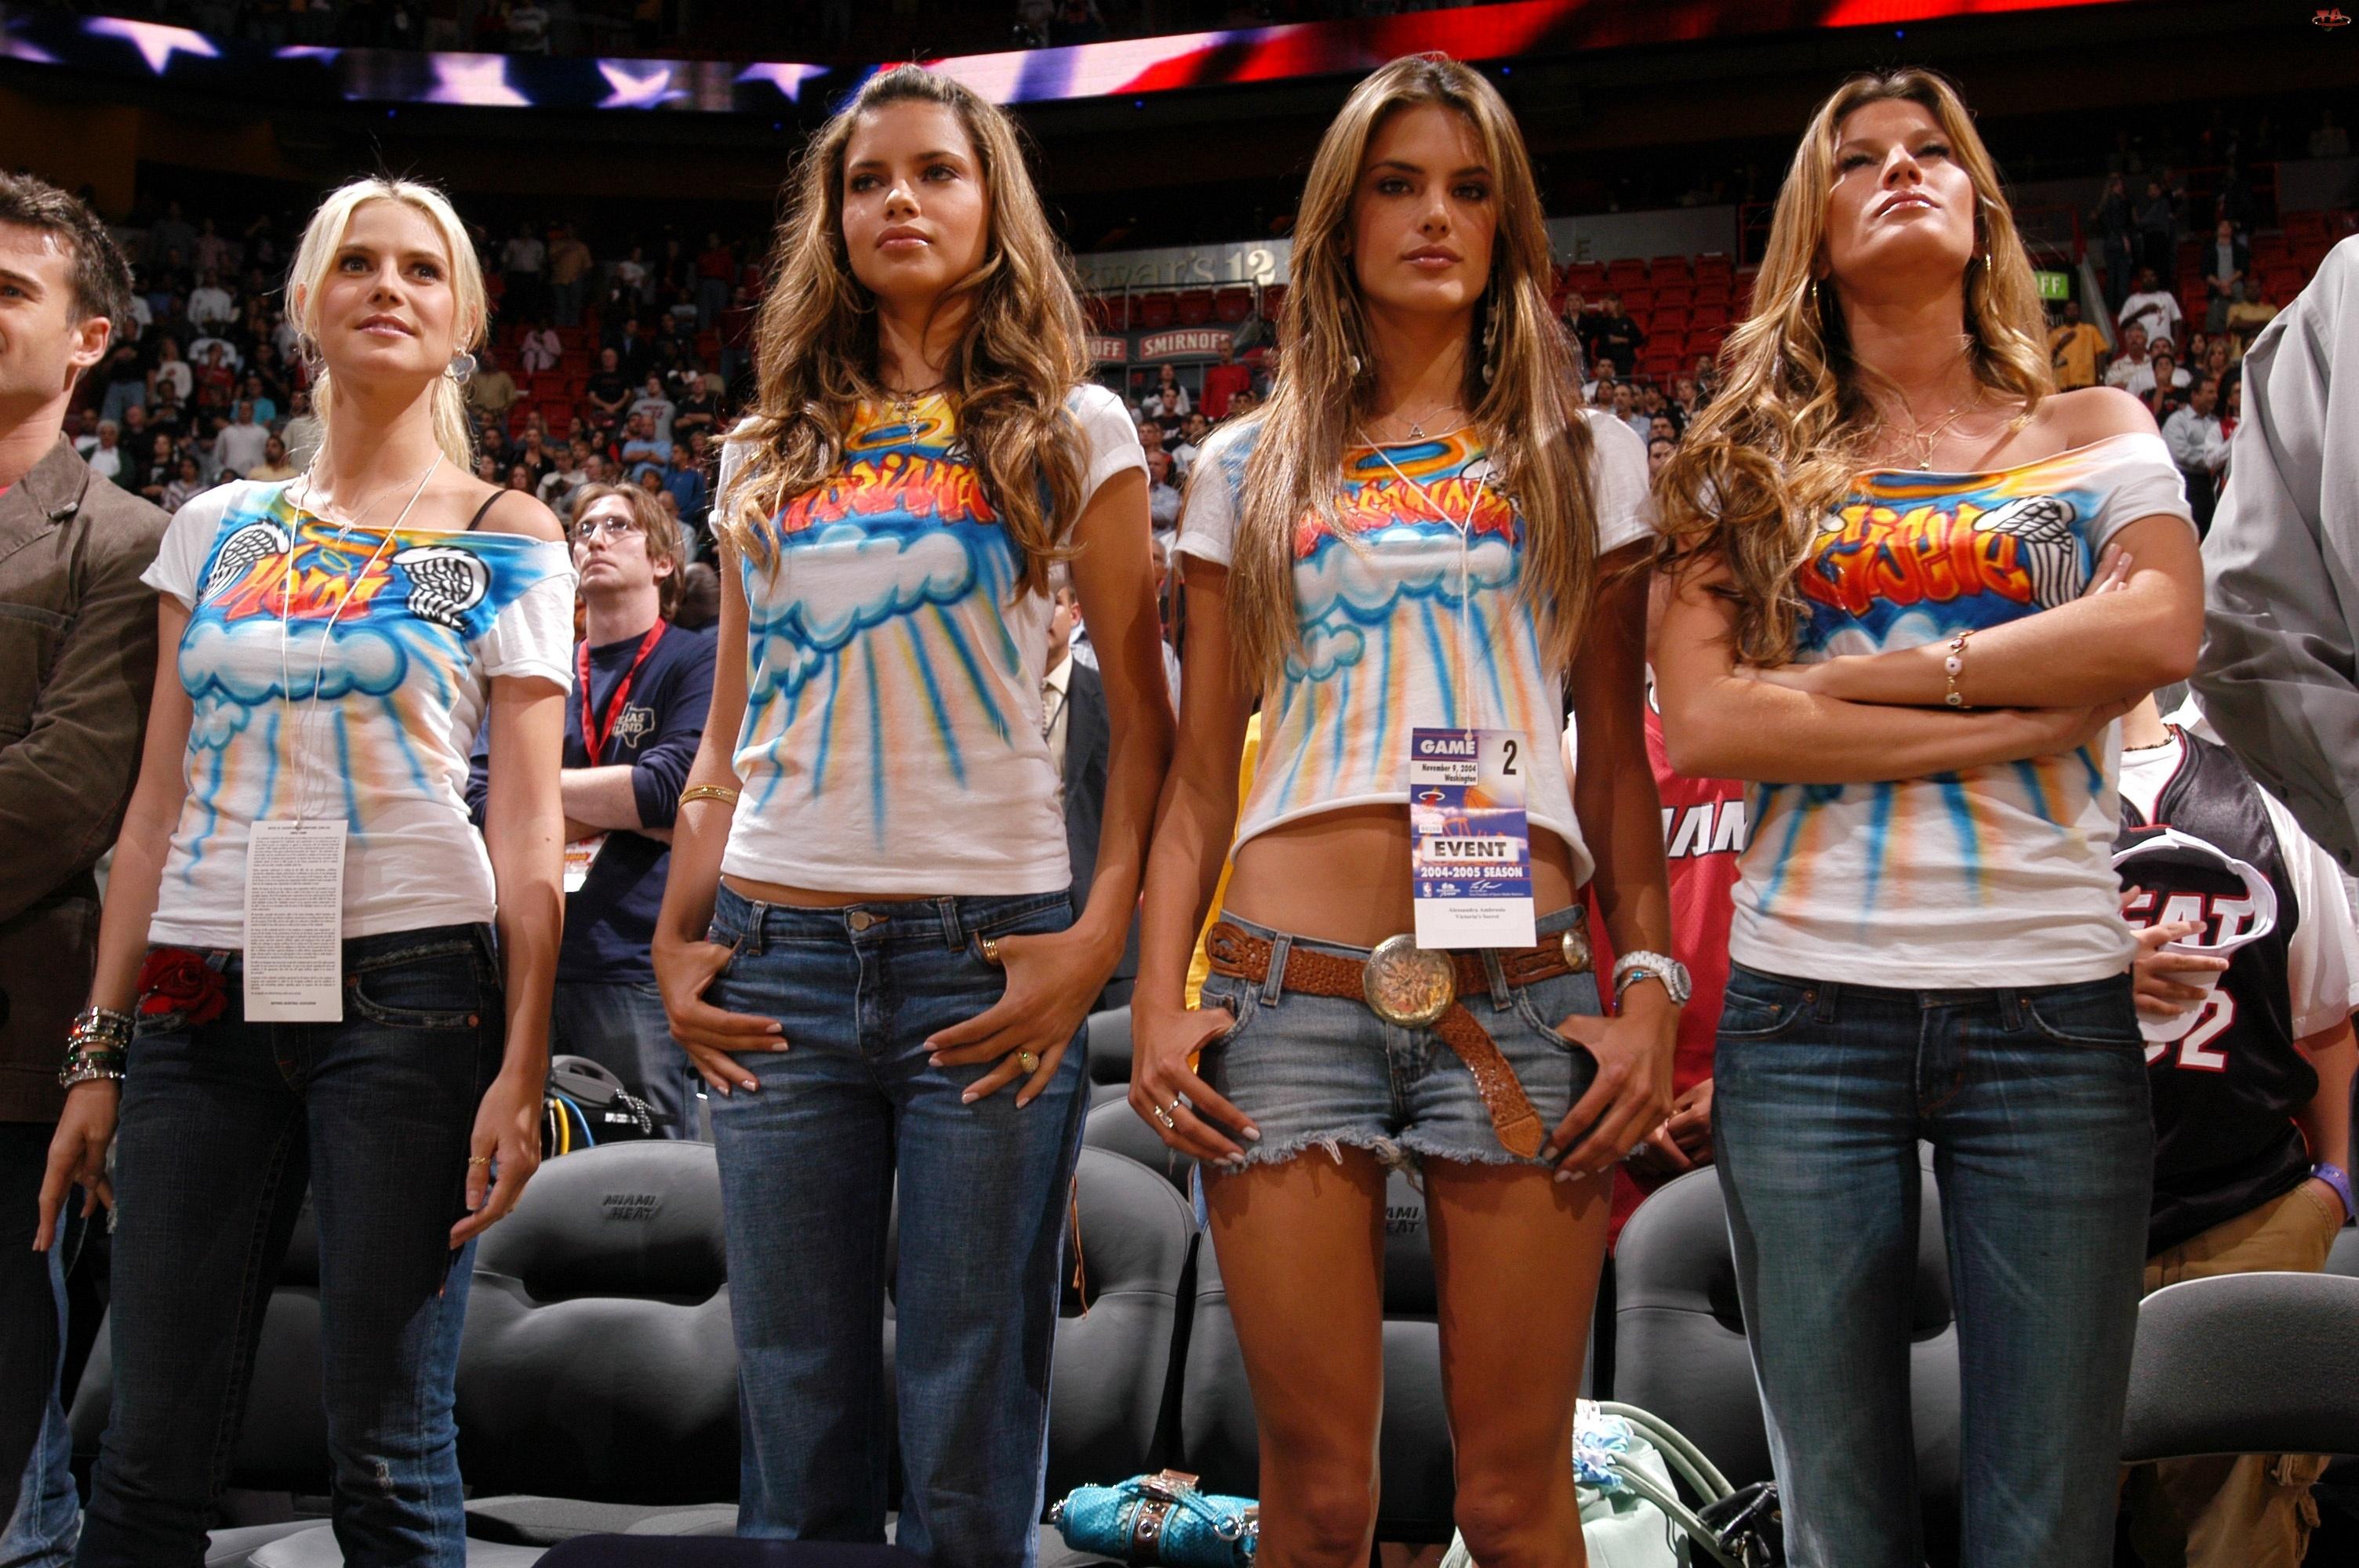 Heidi Klum, Modelki, Alessandra Ambrosio, Gisele Bundchen, Adriana Lima